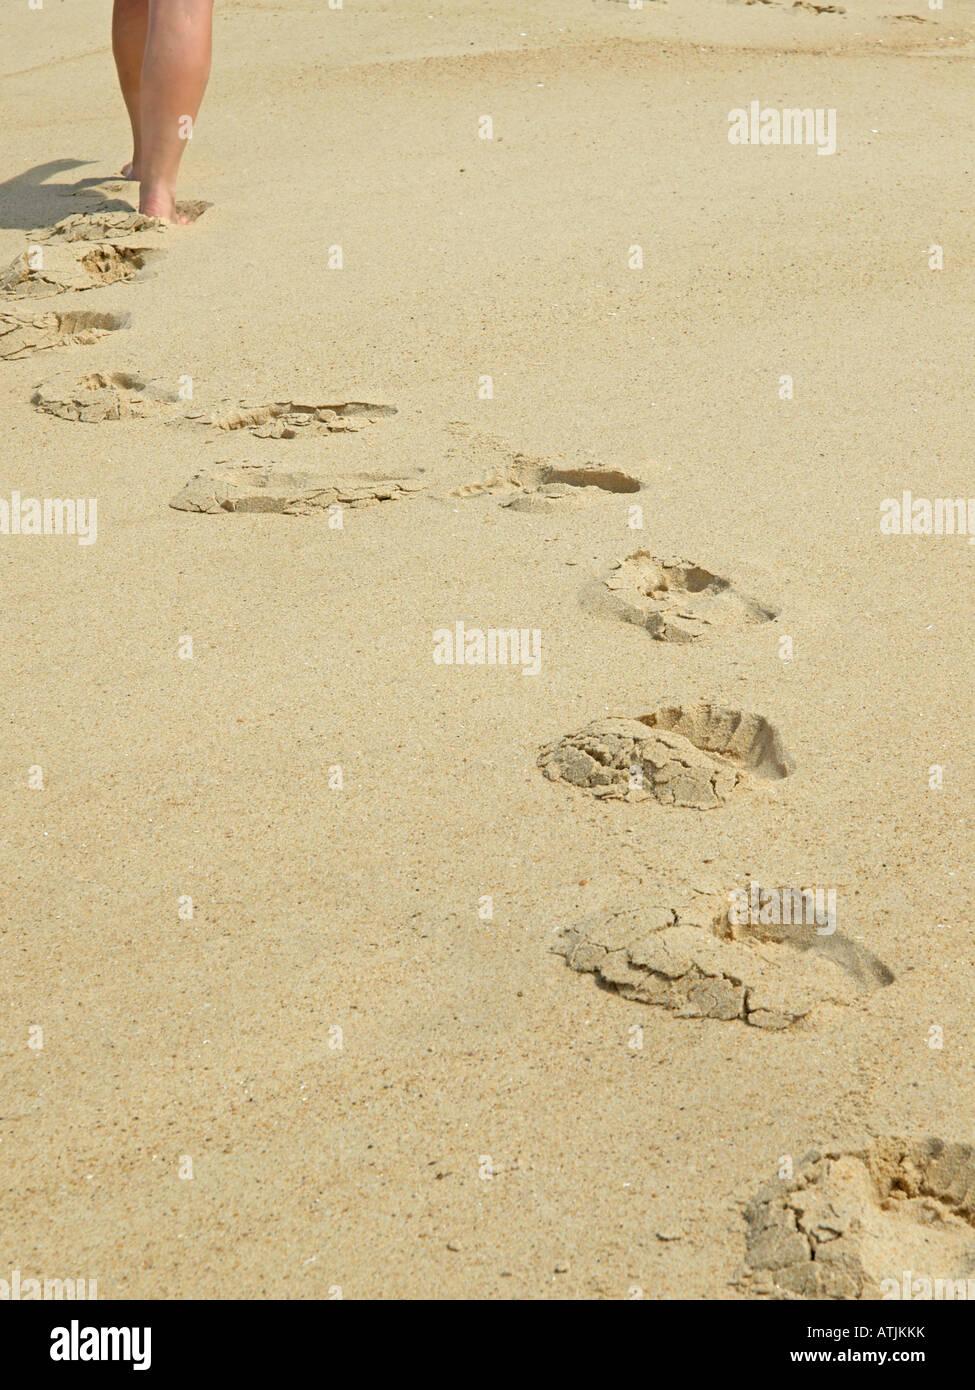 Footprints On Feet Stock Photos & Footprints On Feet Stock Images ...